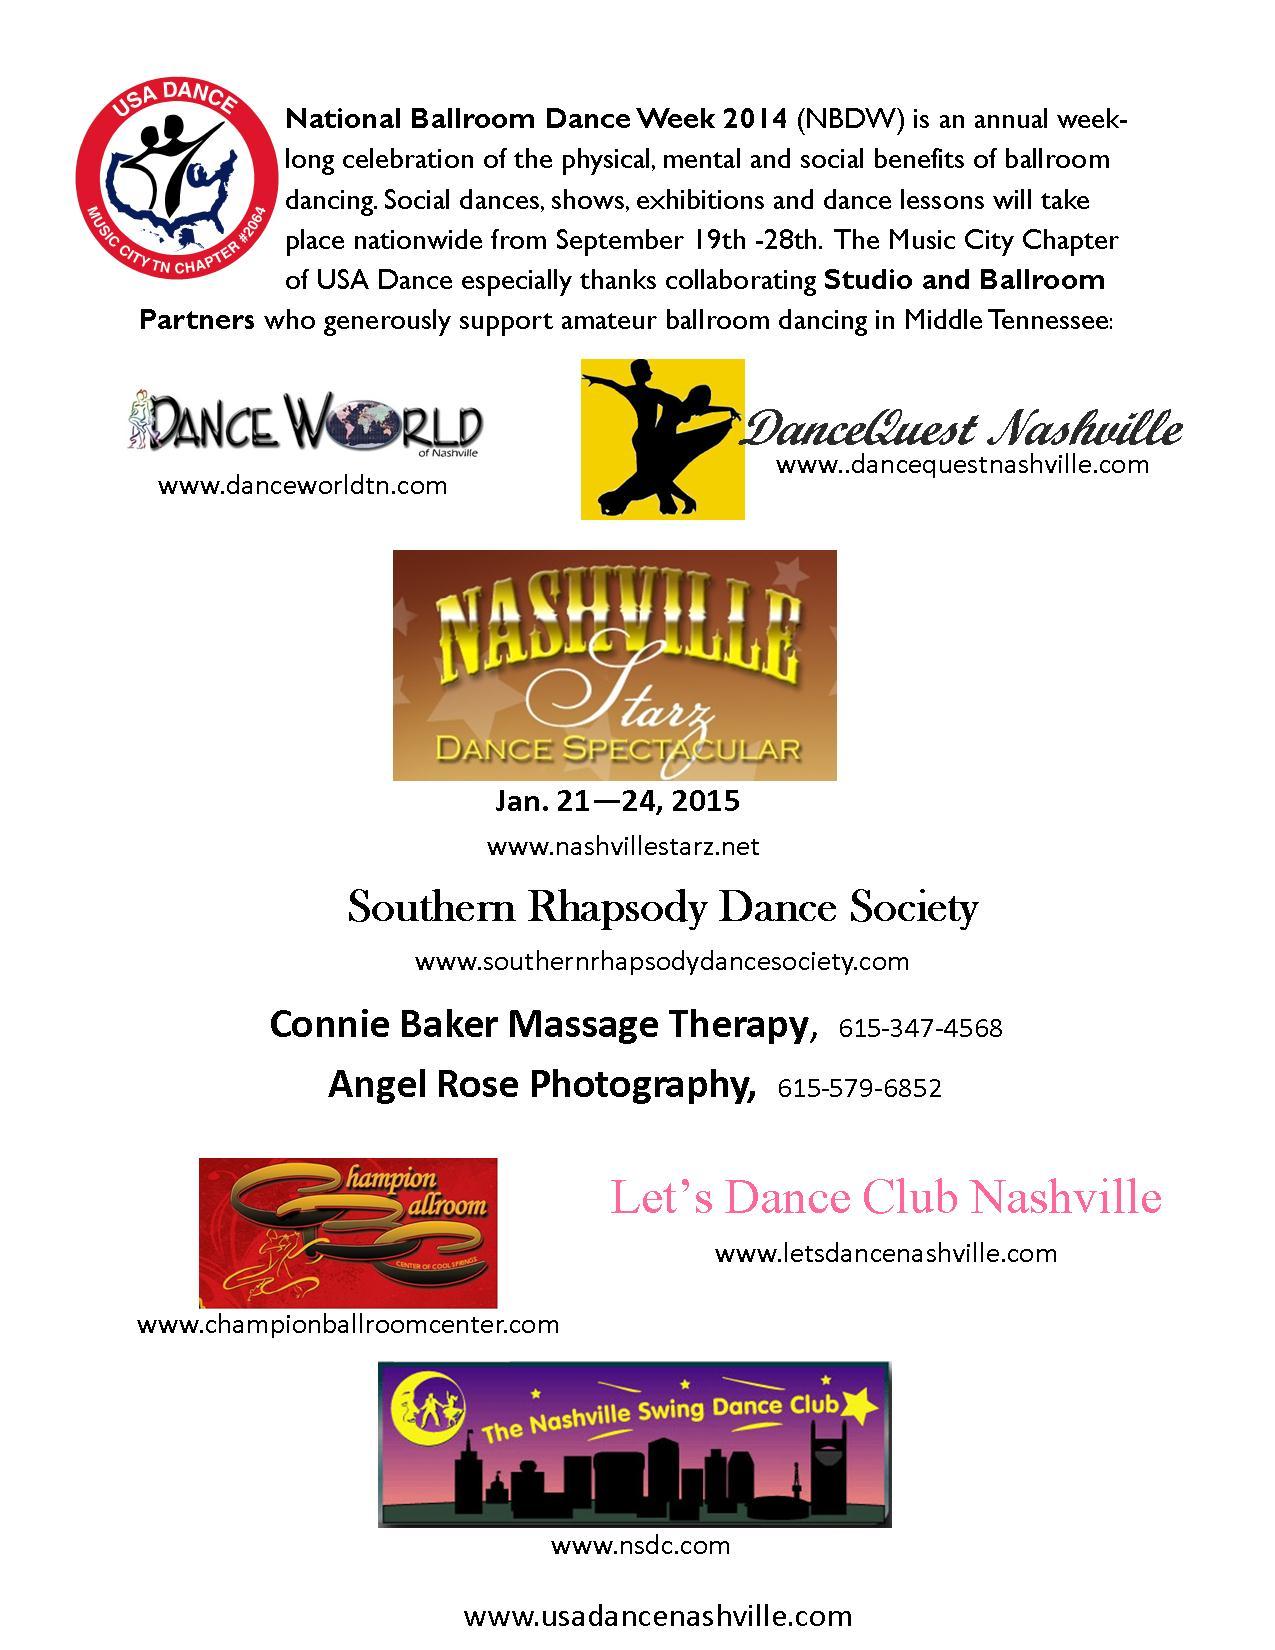 National Ballroom Dance Week Partners 2014